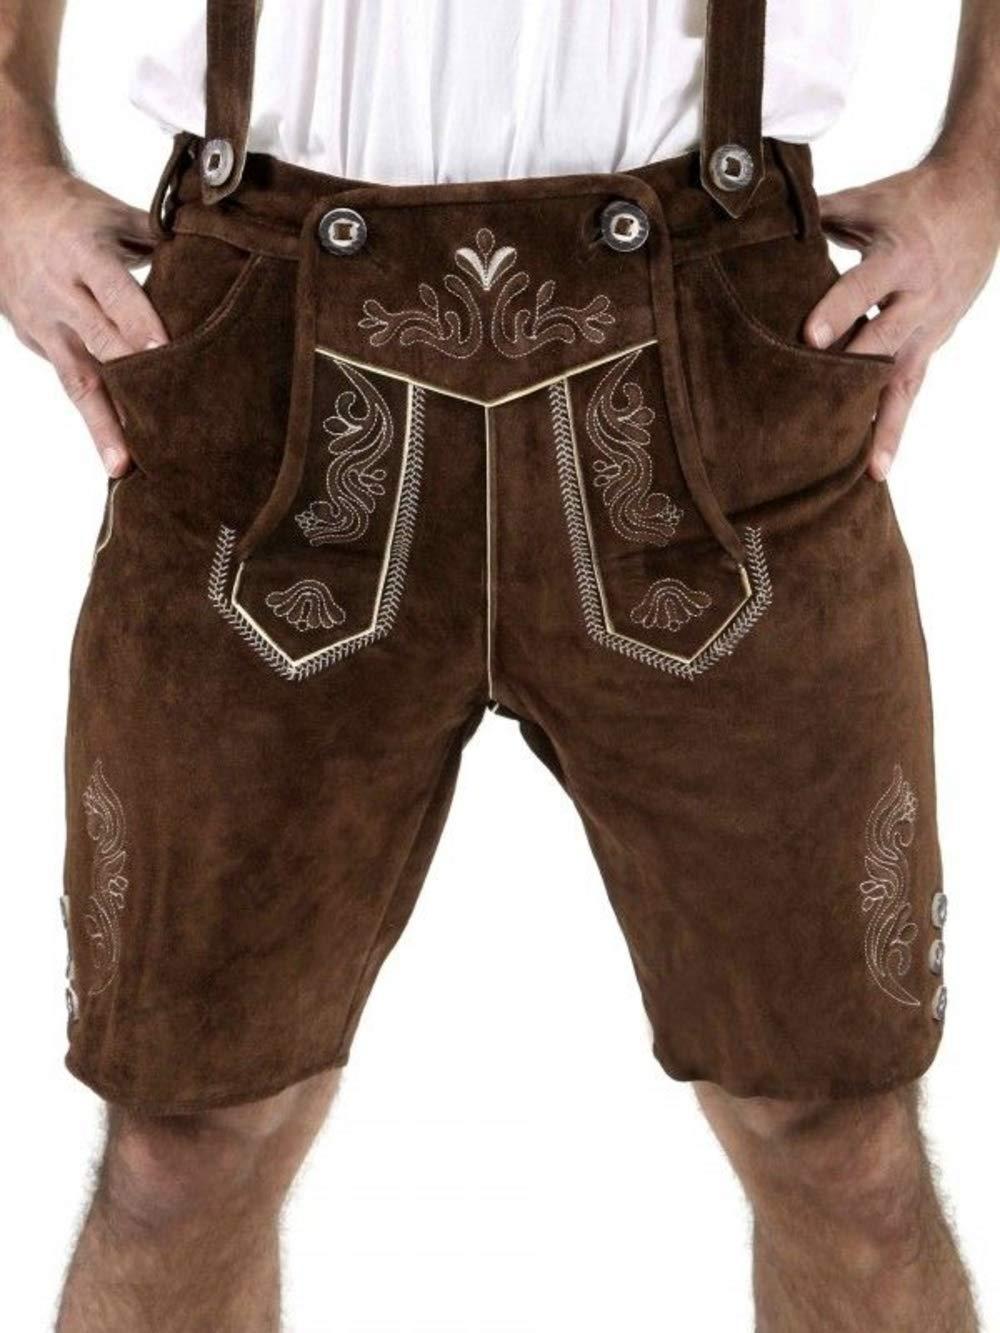 Cuir Craft Authentic Lederhosen German Bavarian Lederhosen Oktoberfest Choc Brown Short Length (36 Inches Waist)